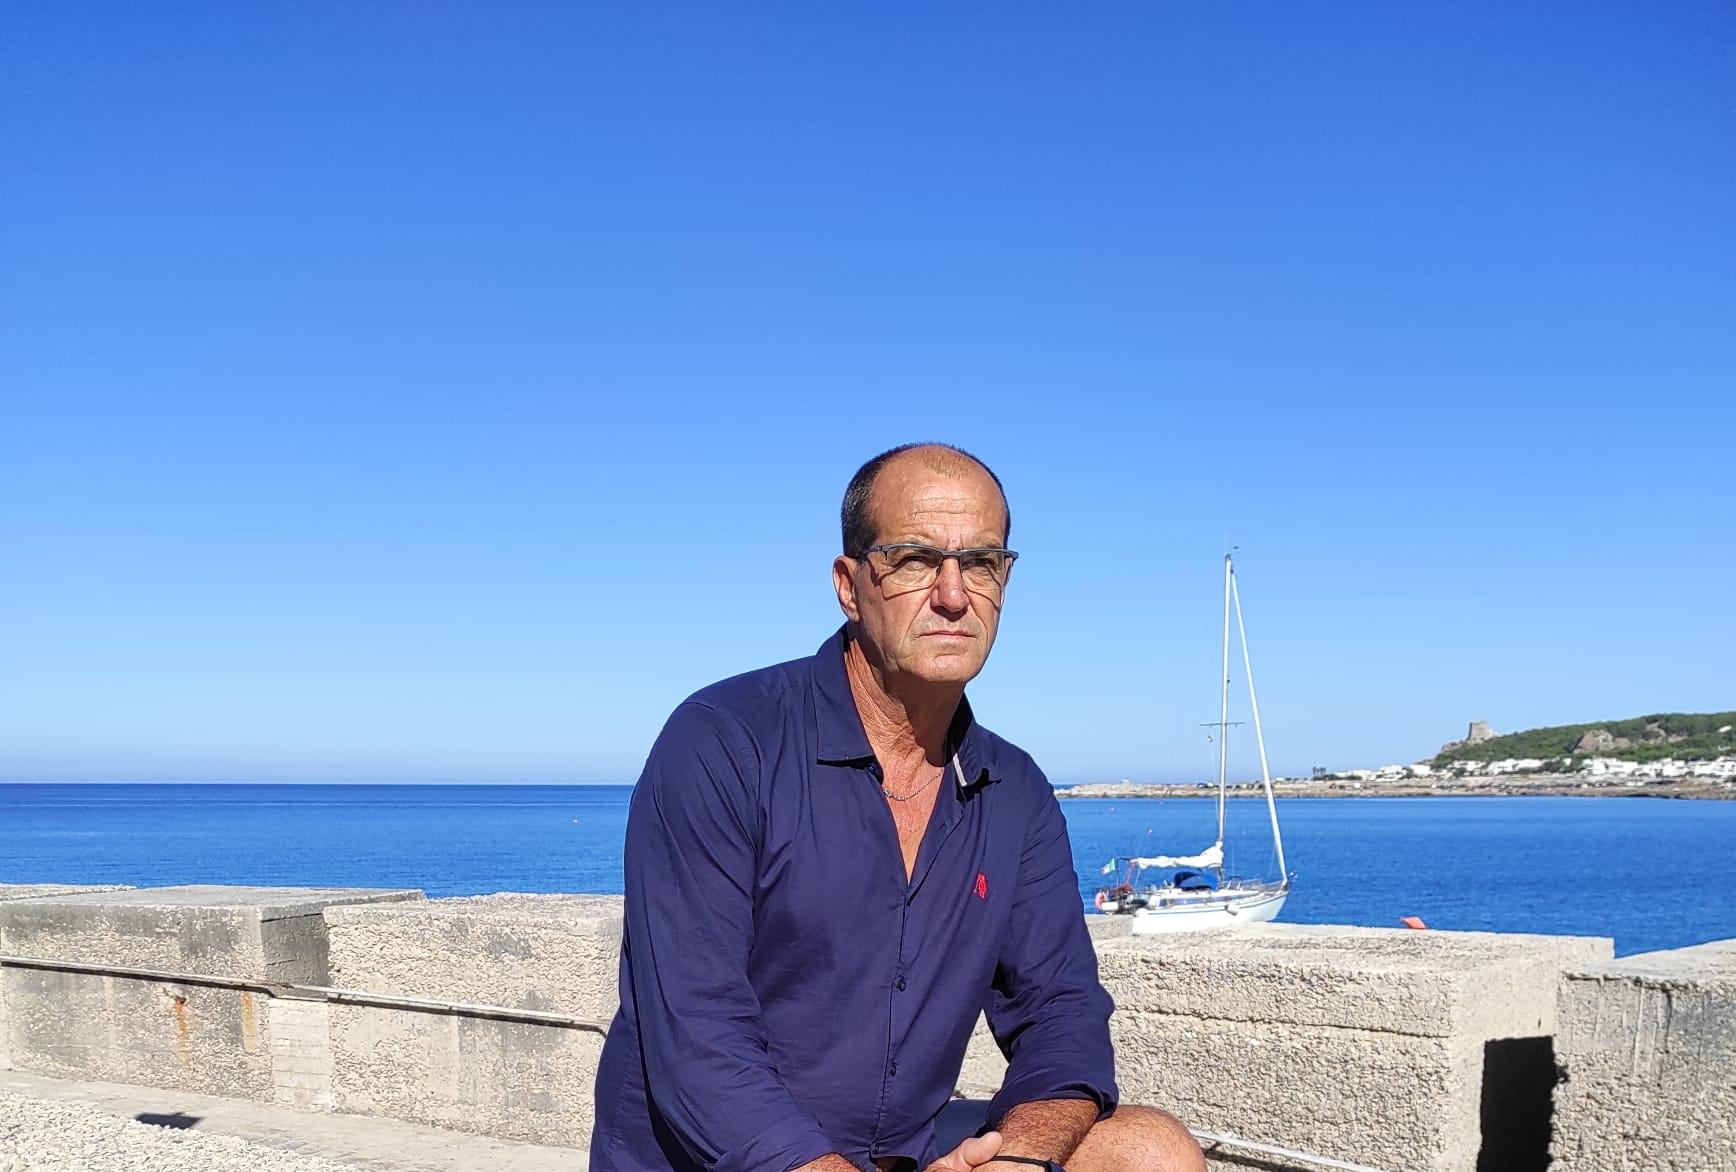 Antonio Mastore